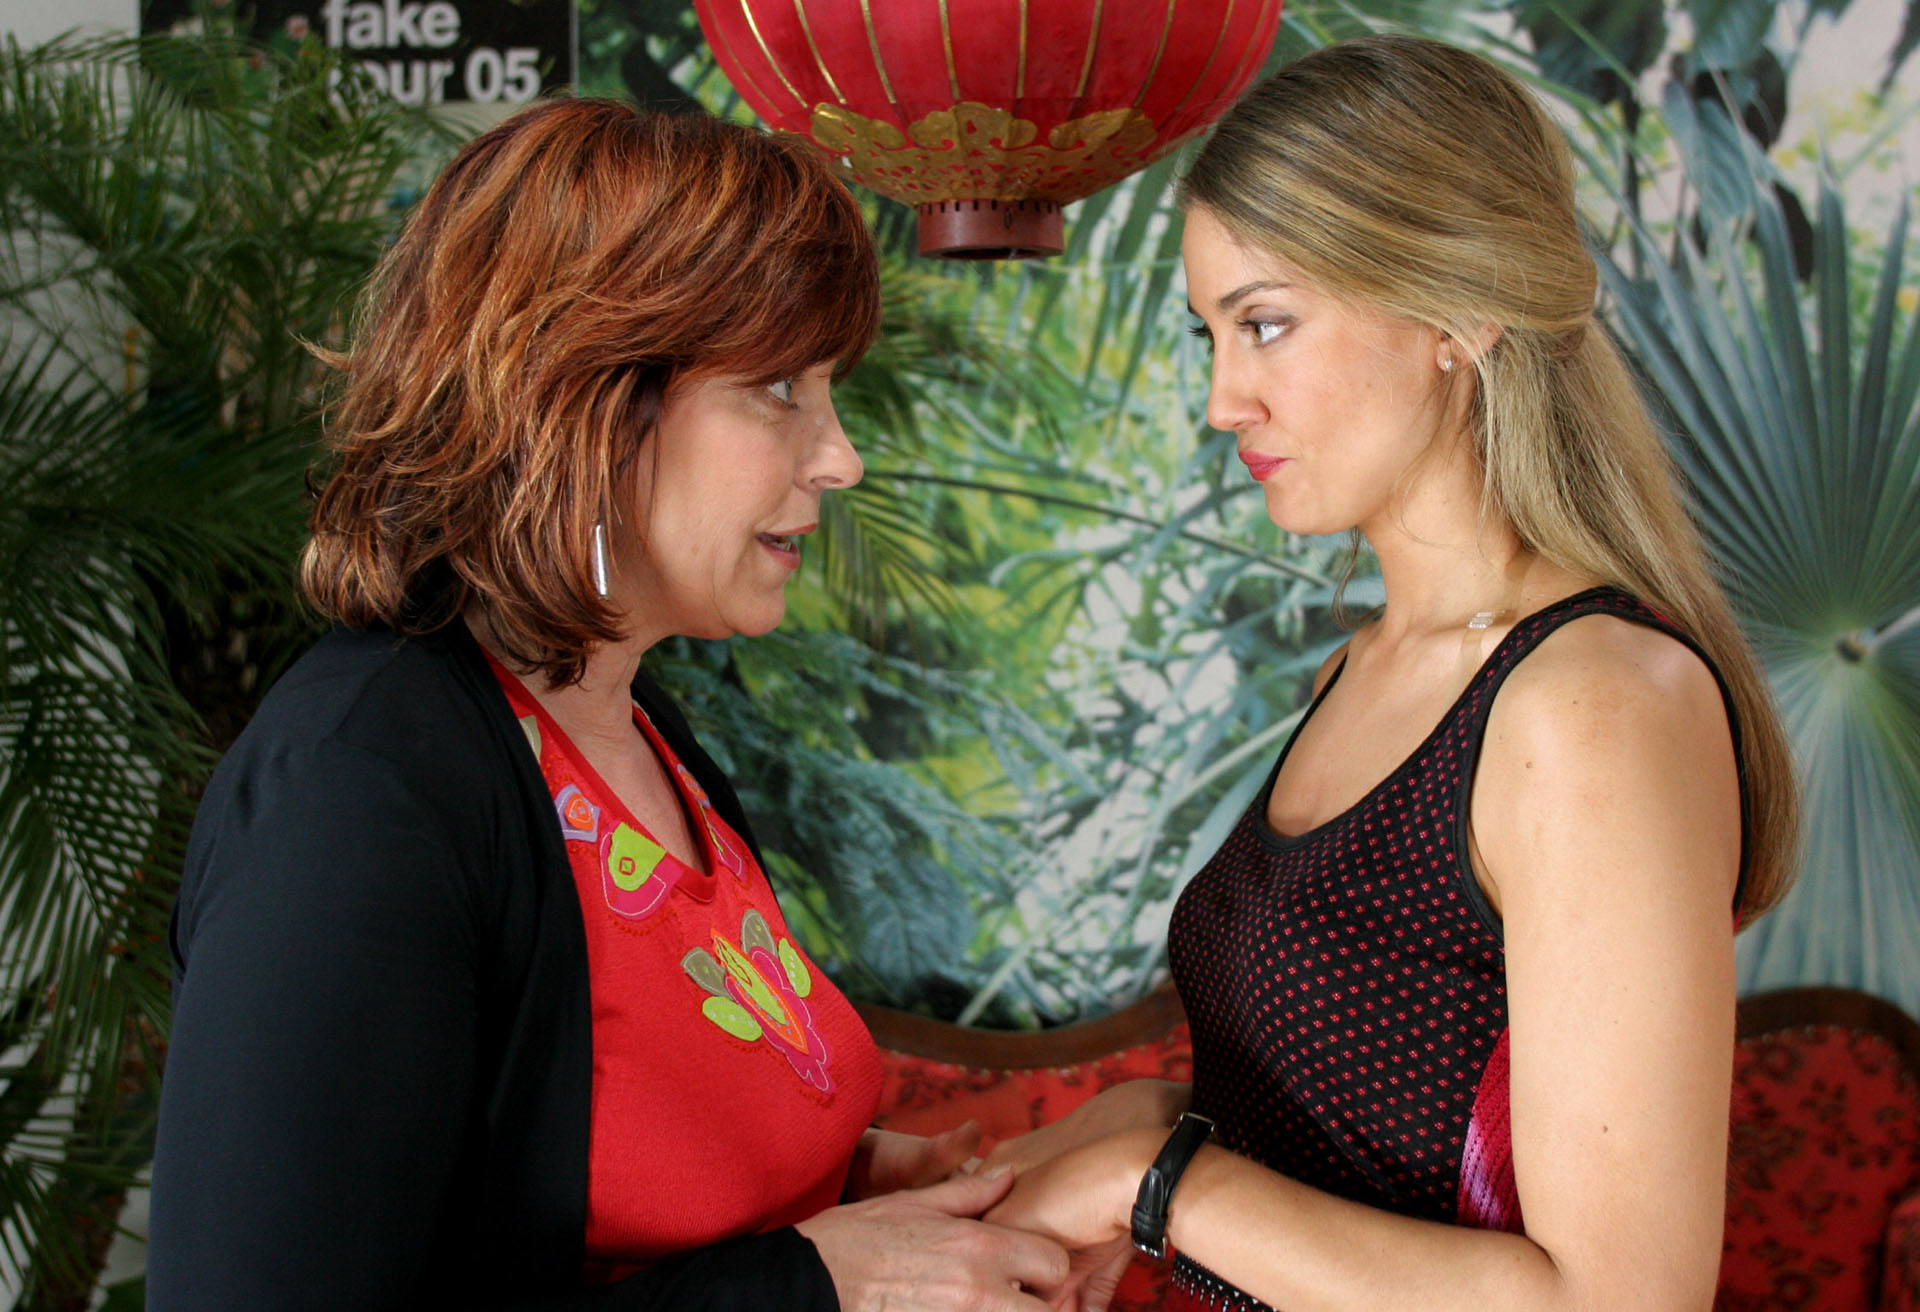 © ORF / Petro Domenigg (Star*Film) - Elfi Eschke, Nicole Ennemoser